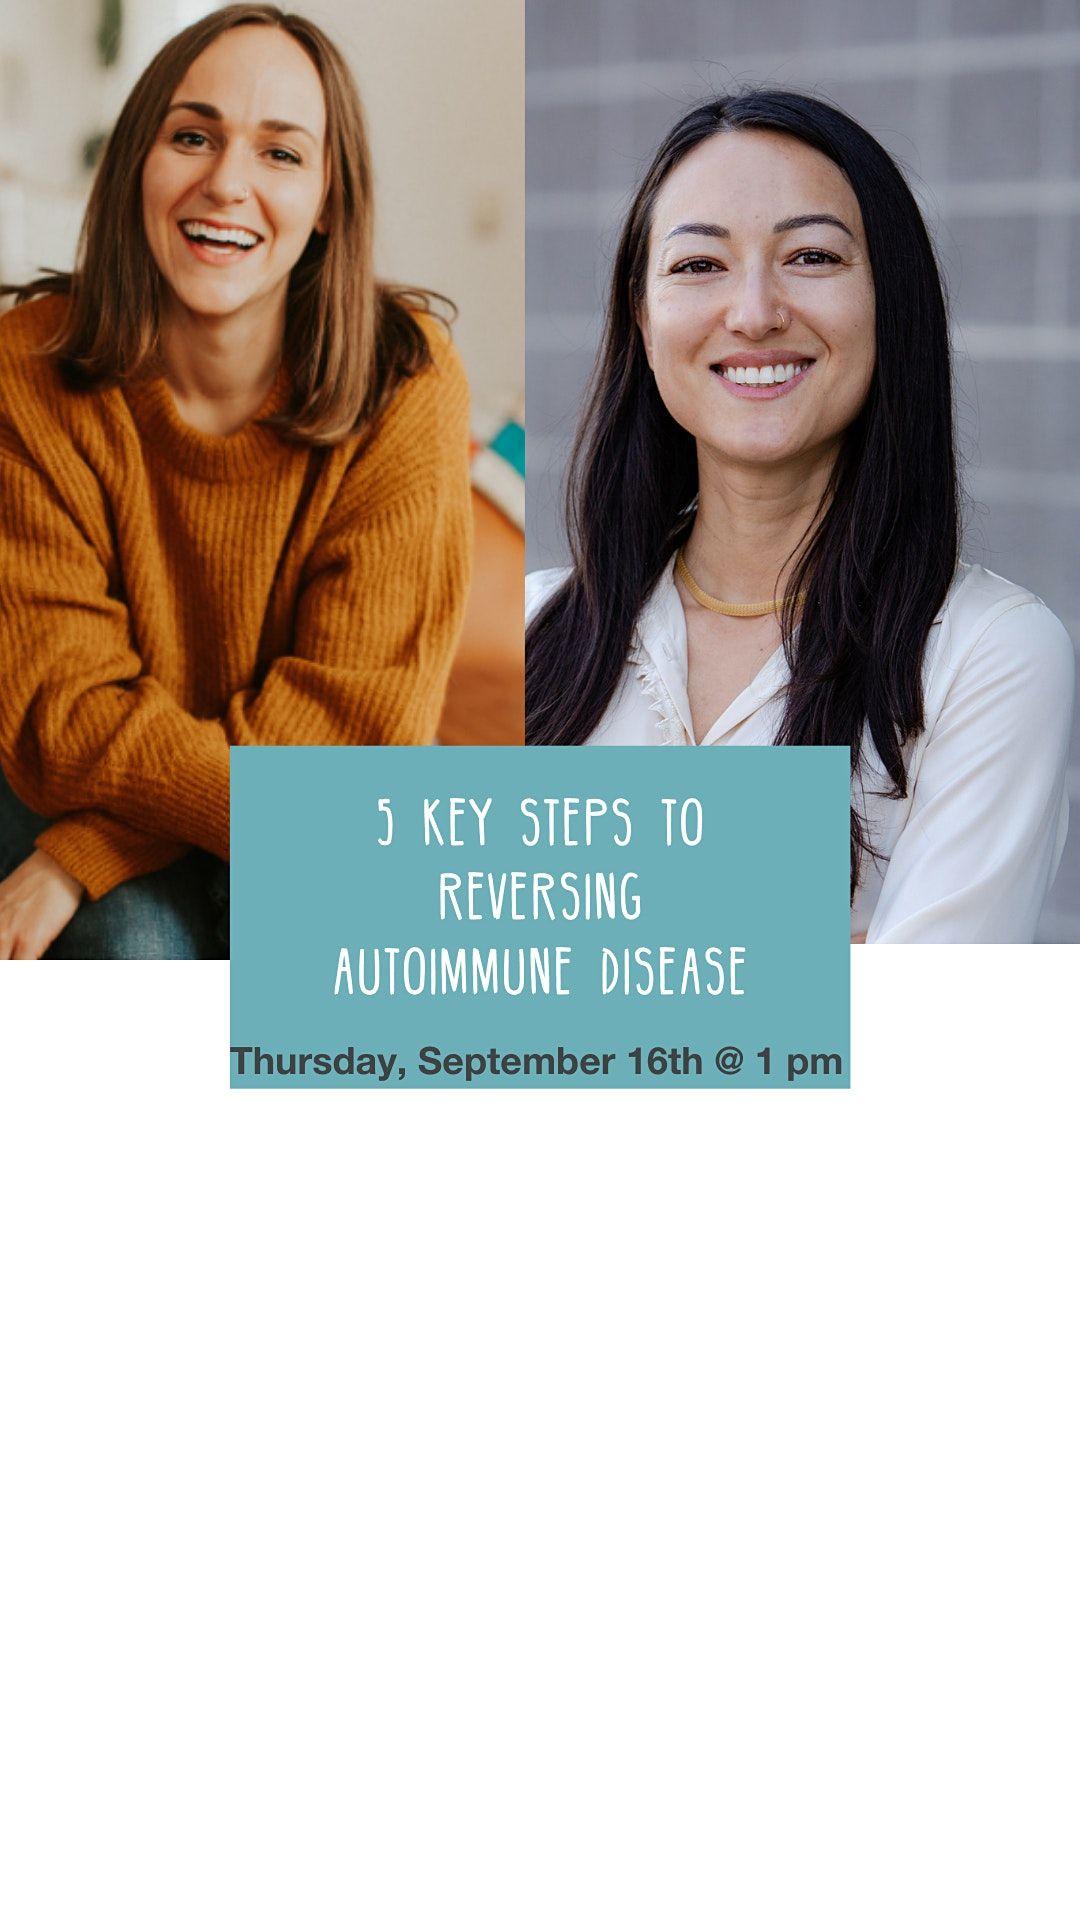 5 Key Steps to Reversing Autoimmune Disease